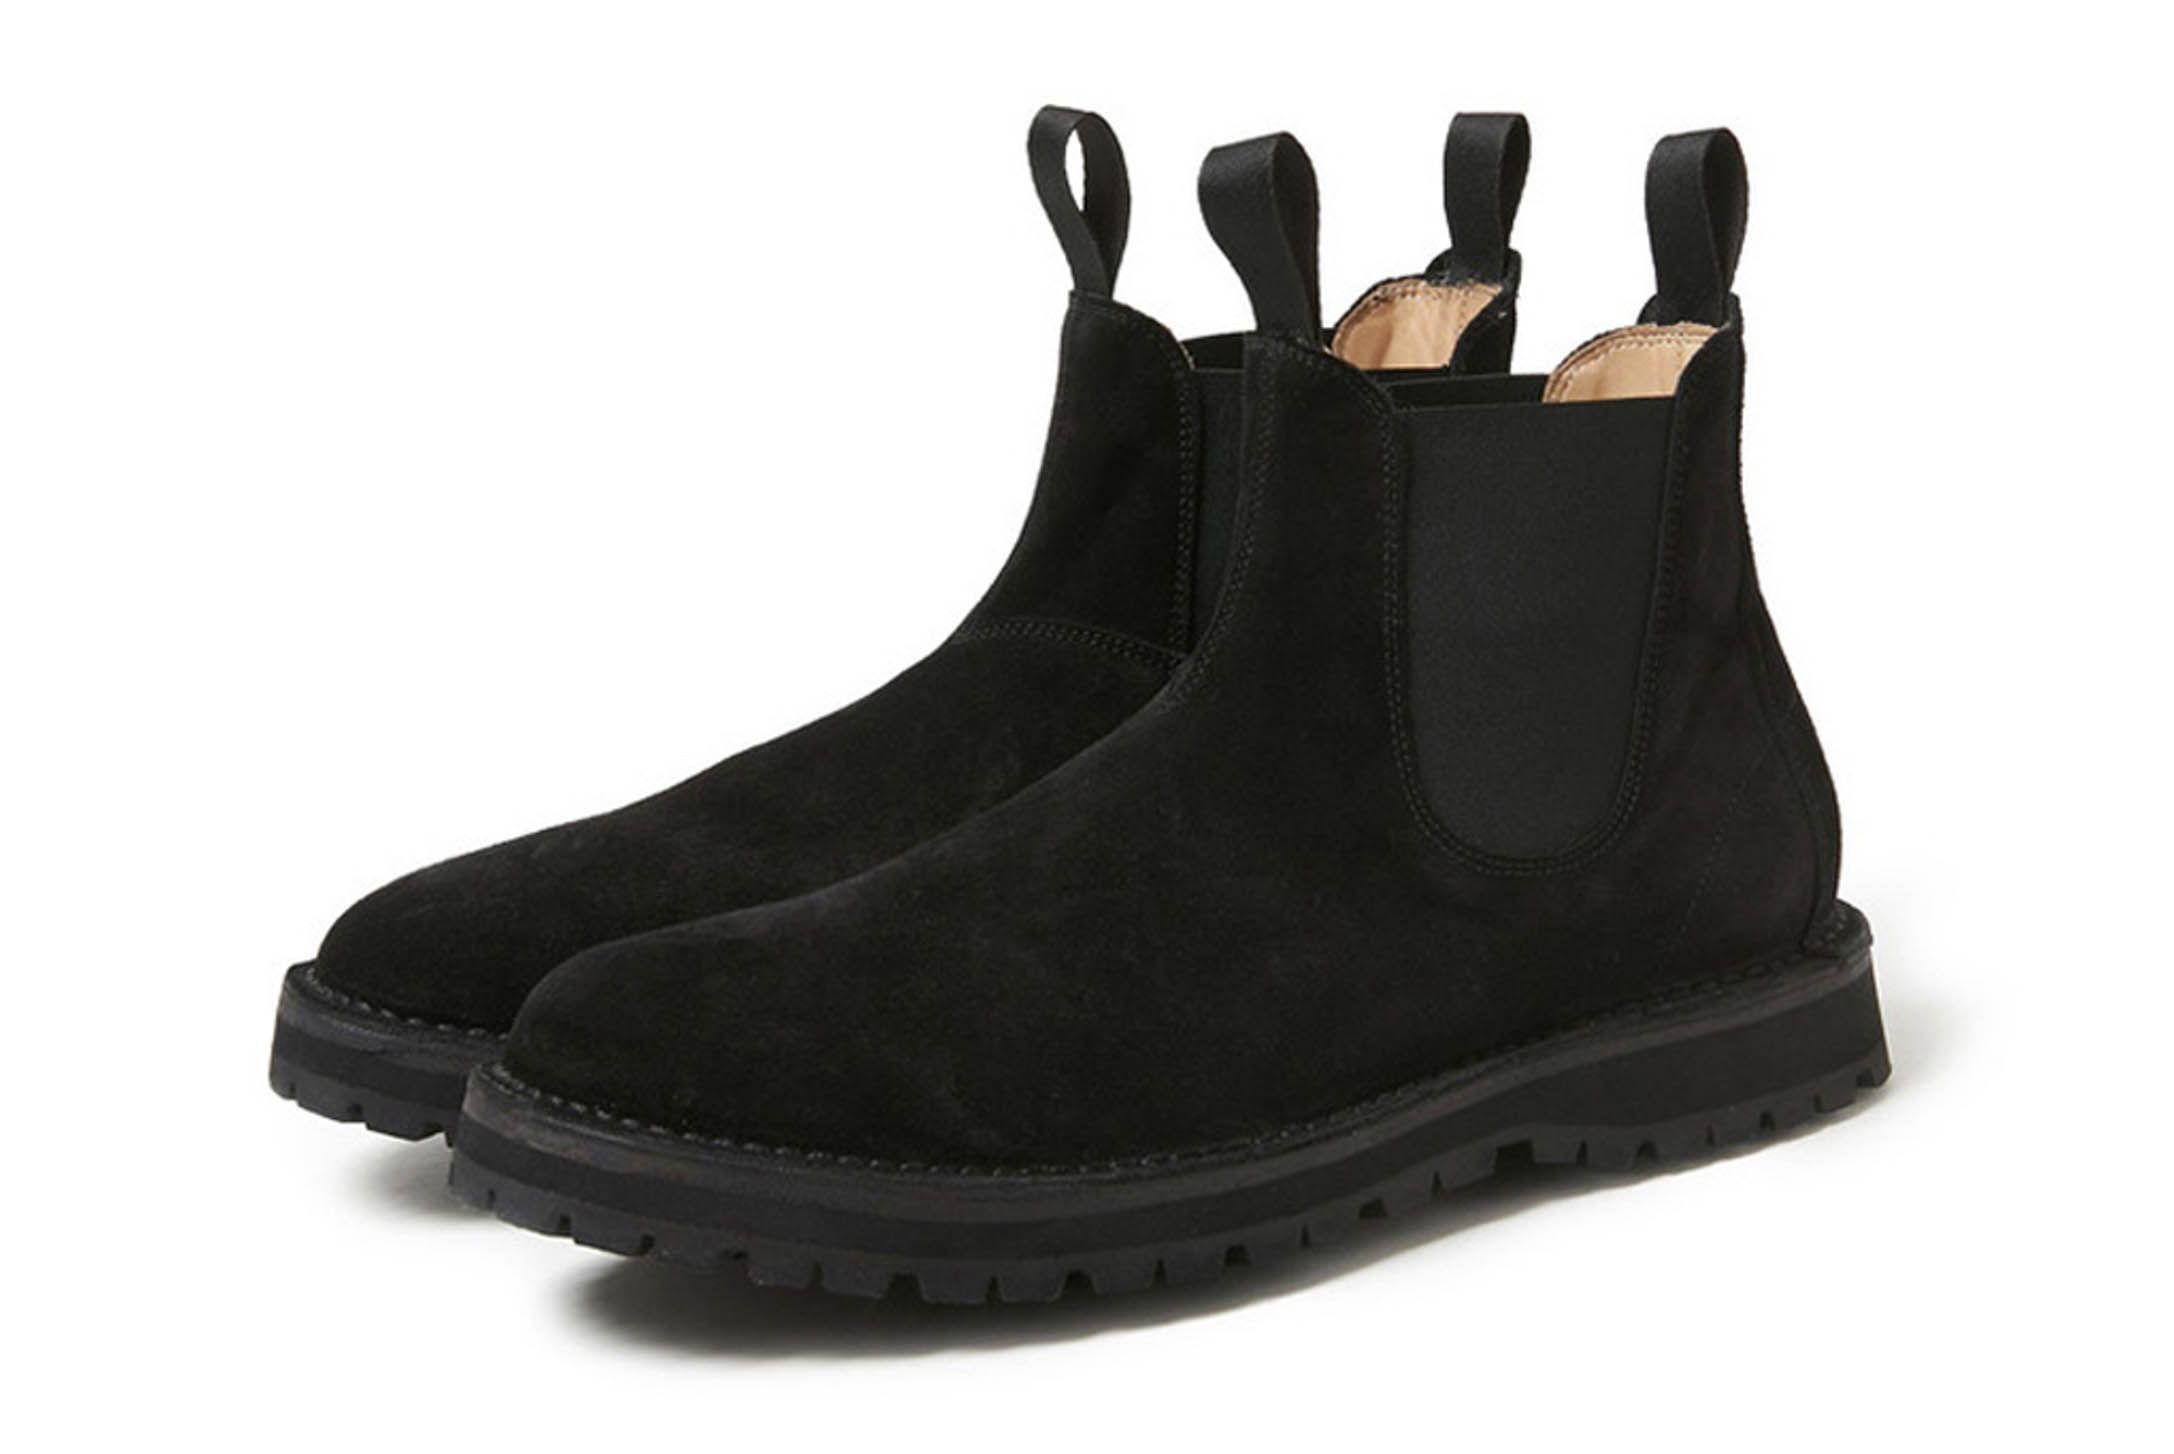 Nonnative Spring Summer 2018 Footwear Collection 1 Sneaker Freaker